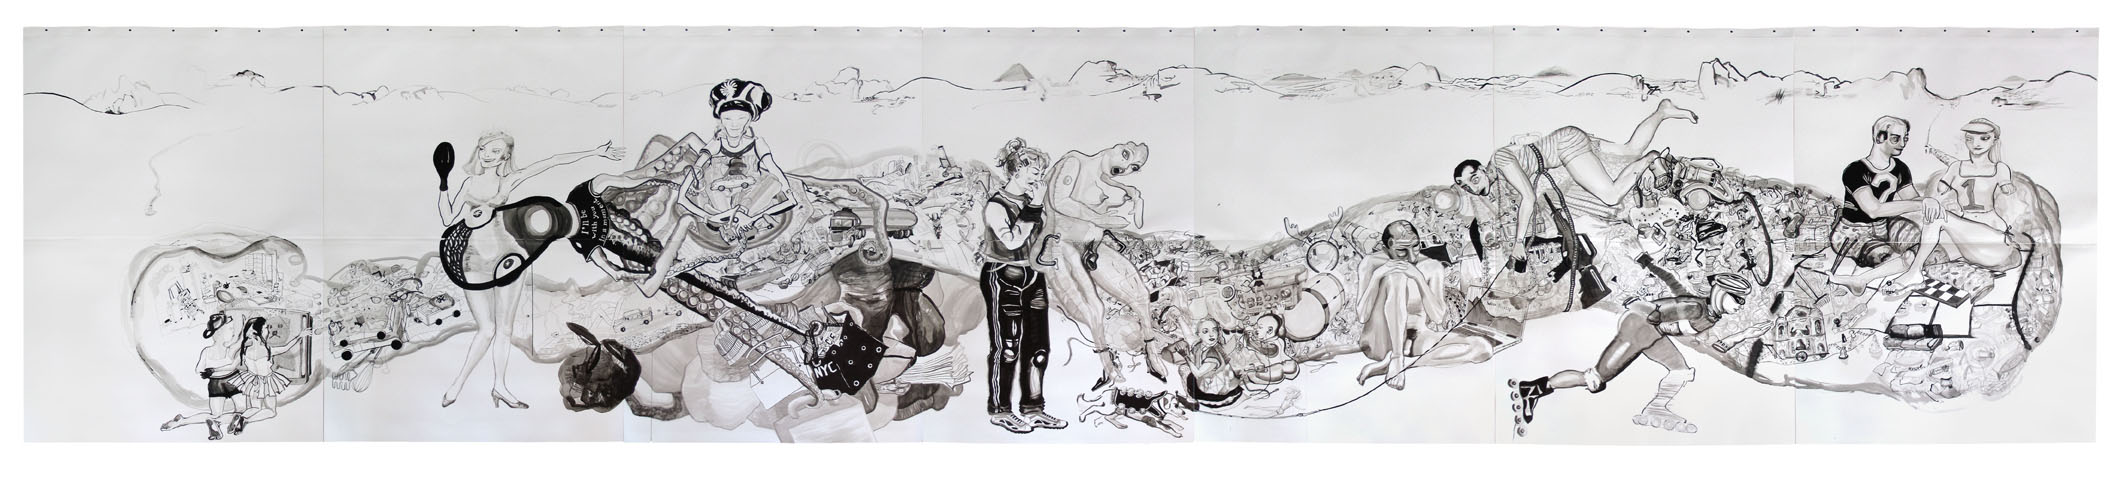 Necessary Objects, inkt op papier 2004, 2.00 x 9.60 m